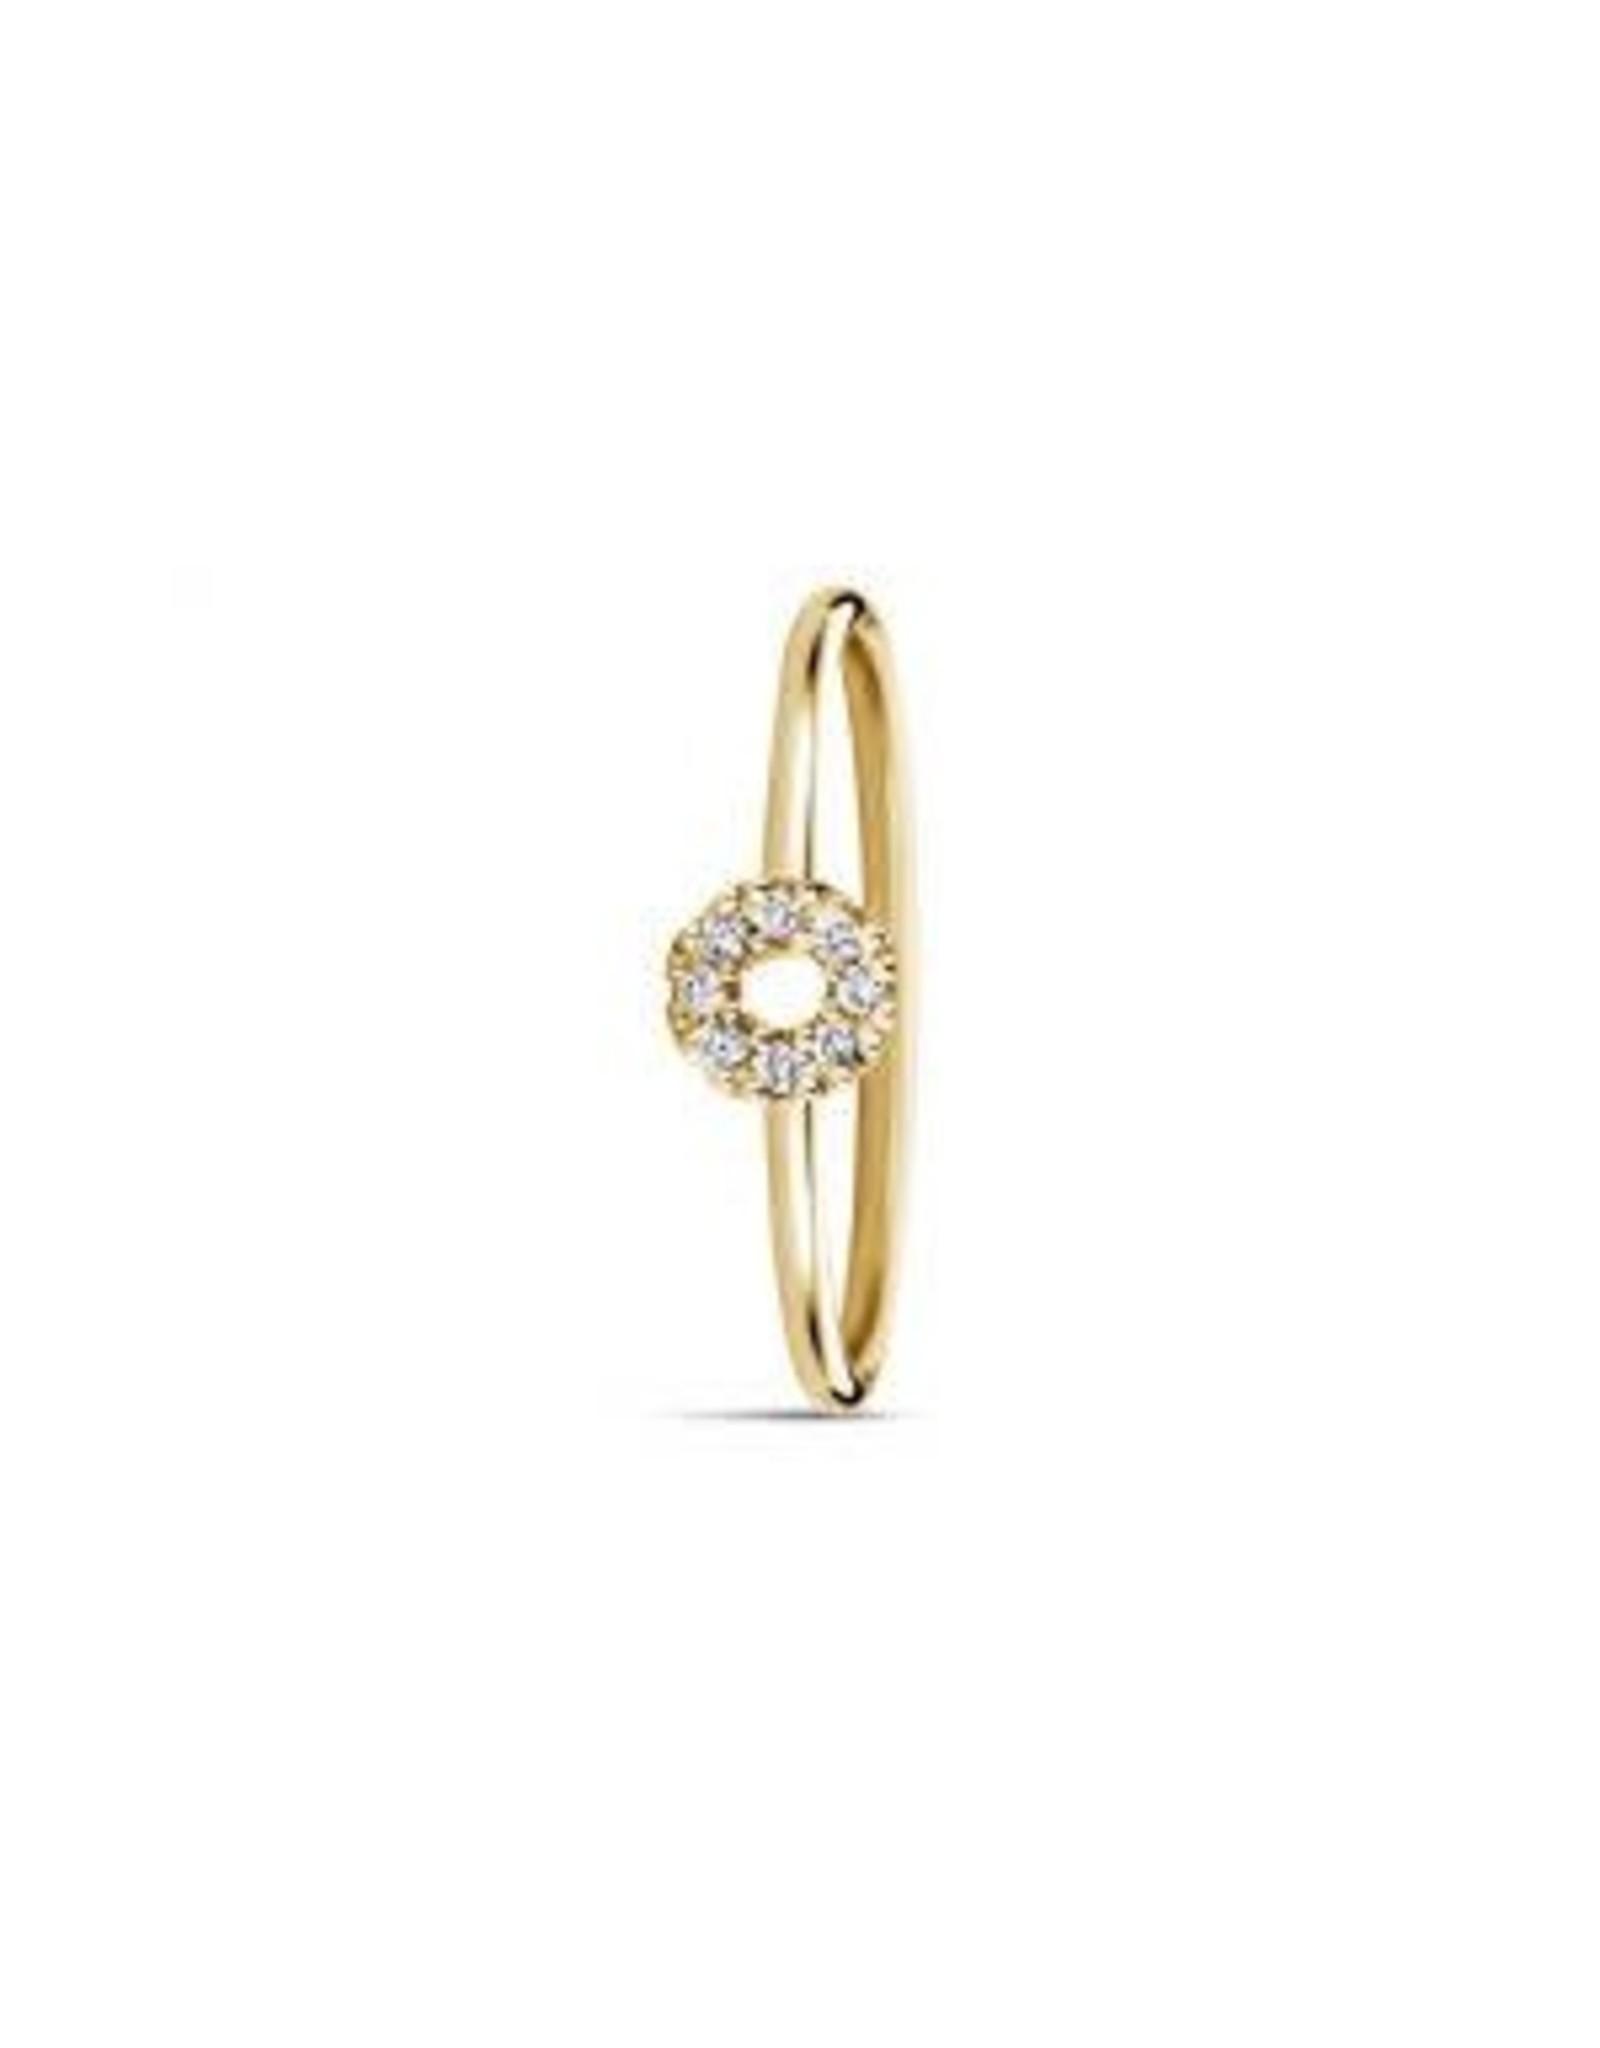 Miss Spring Ring Geel Goud 18kt MSR645GG-DI